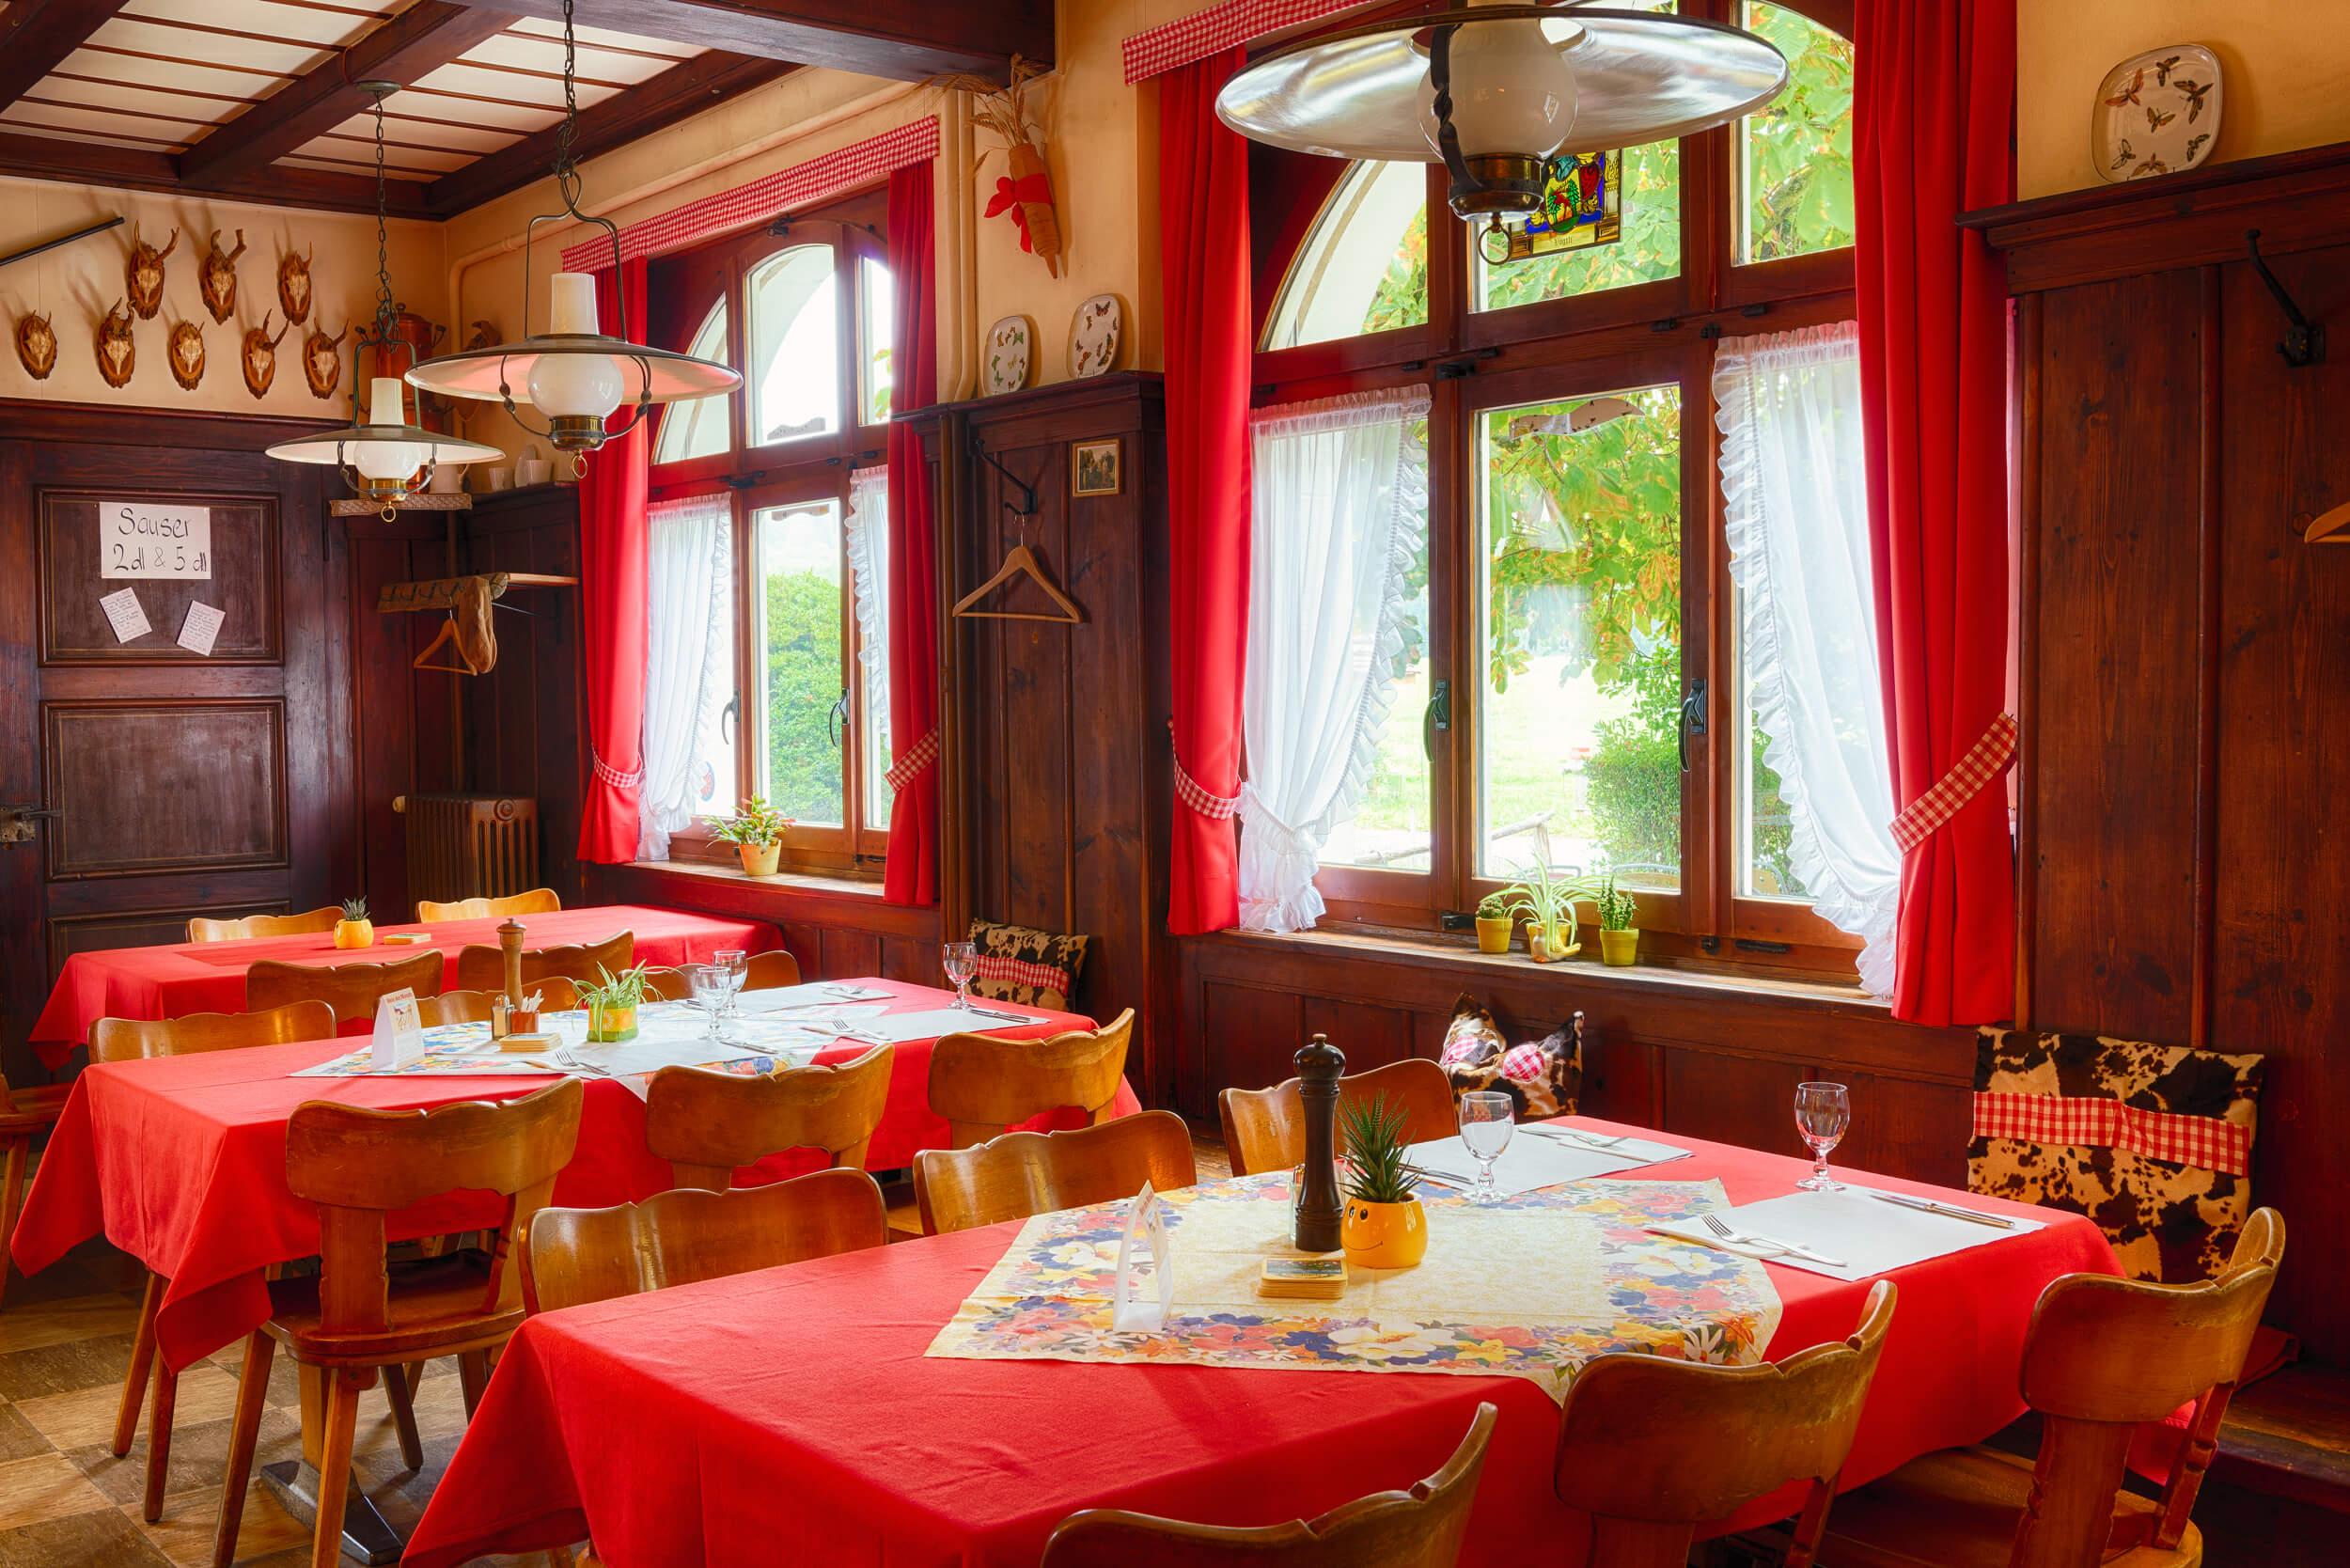 Restaurant Schönmatt innen 8.jpg